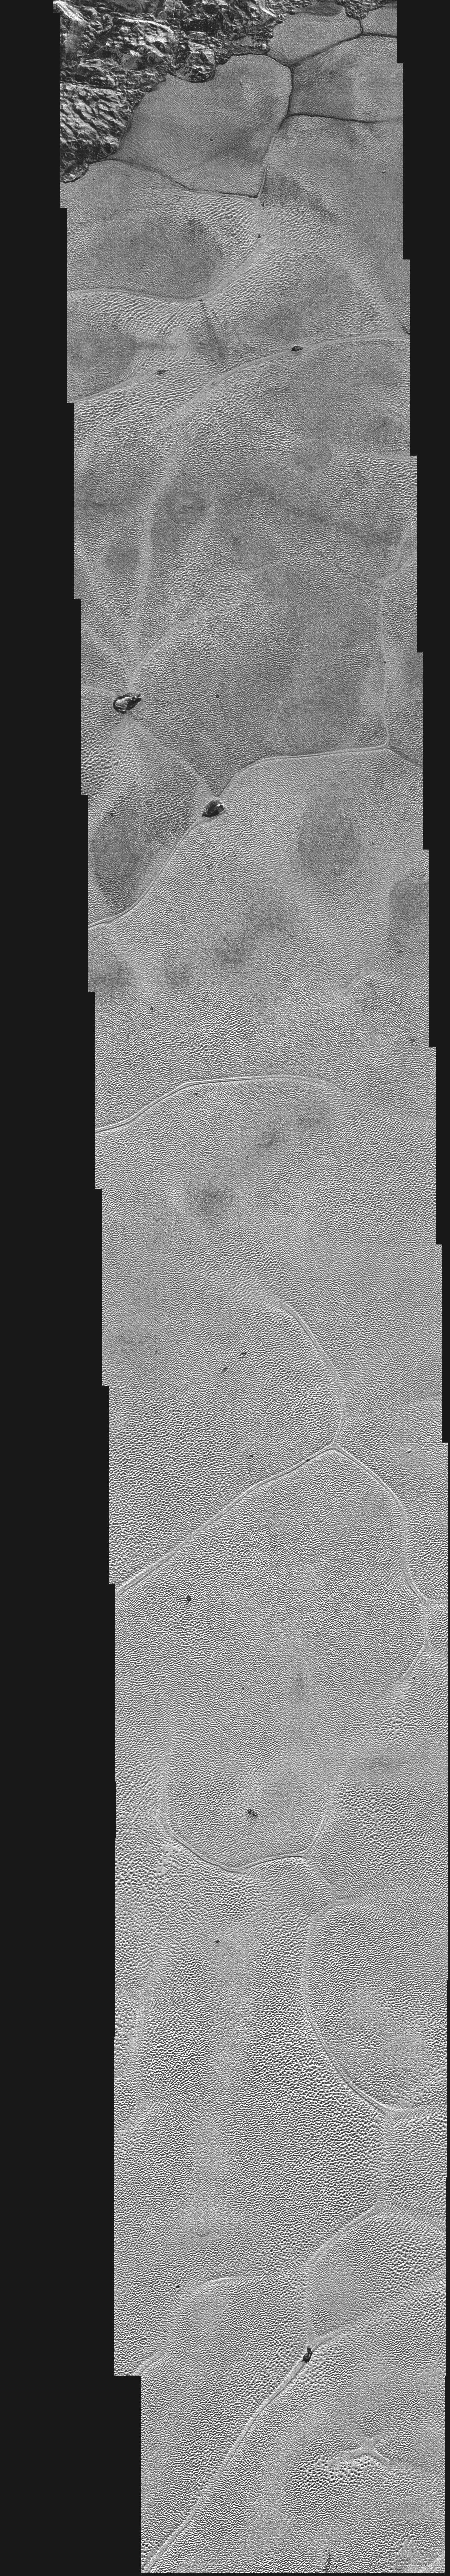 pluton-fotograflar-110616-sputnik-planum-7